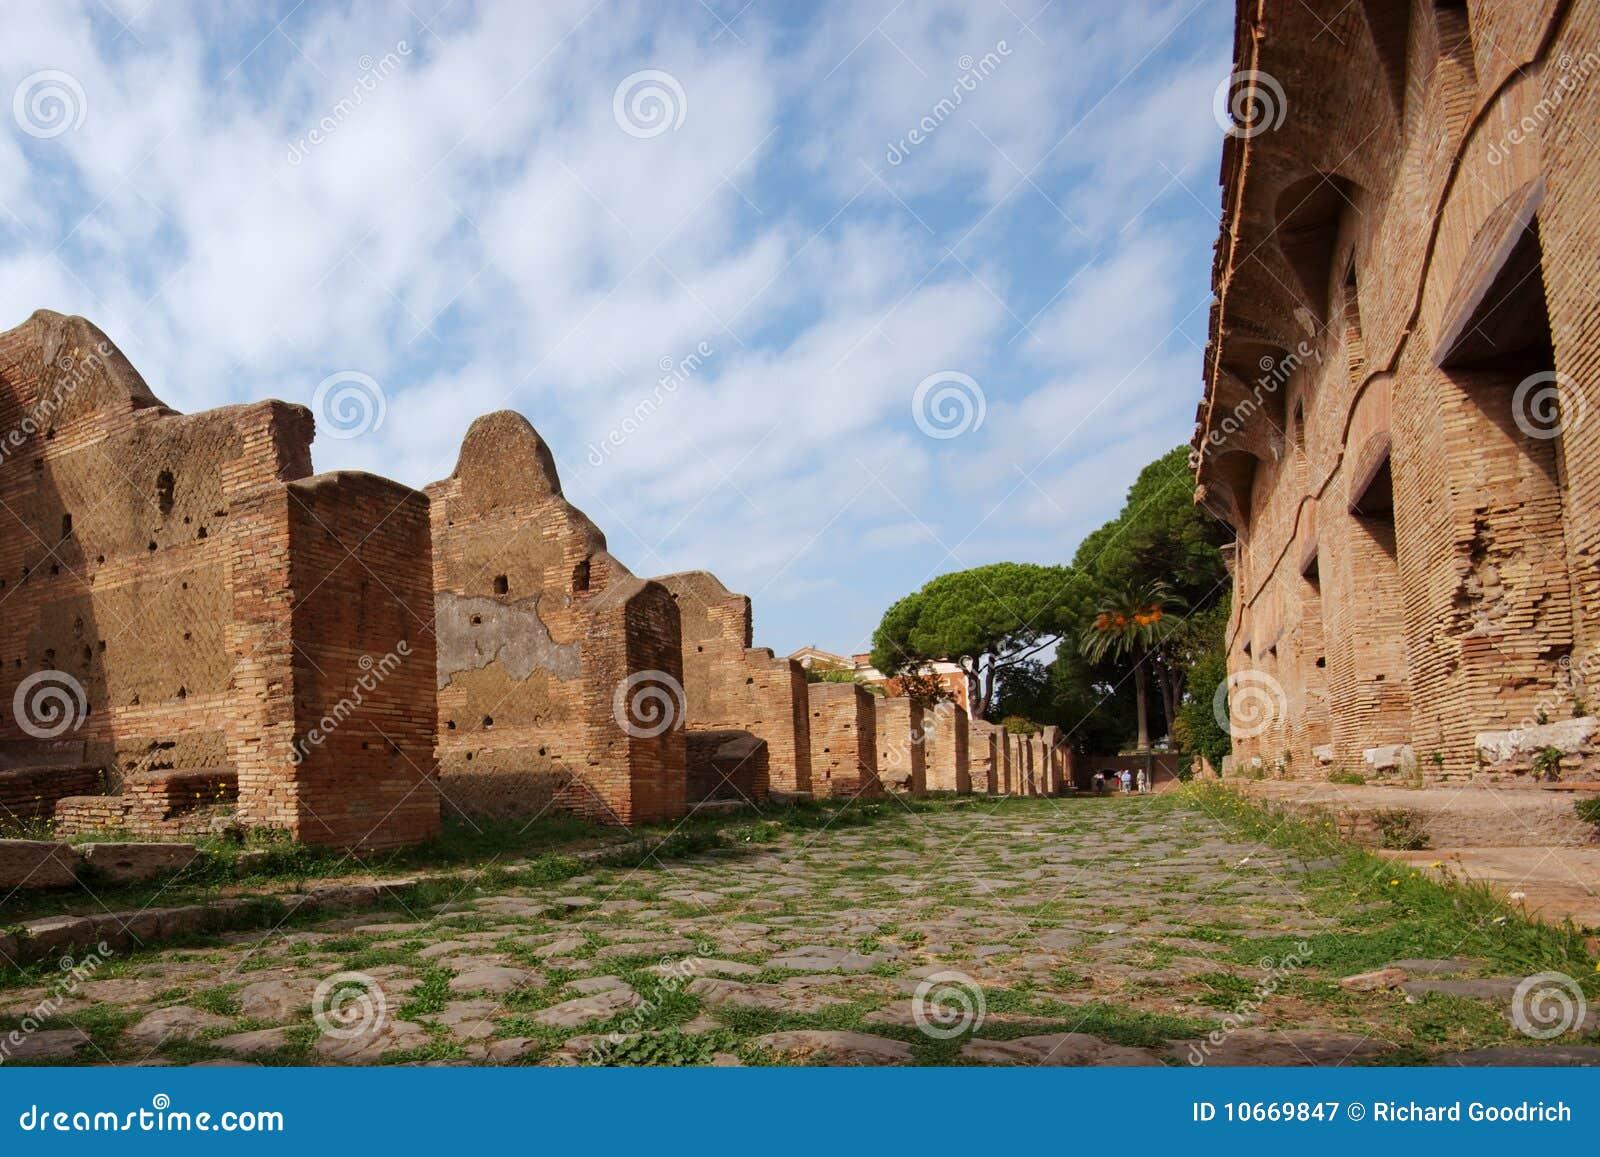 Roman road ostia antica italy royalty free stock for Mr arredamenti ostia antica